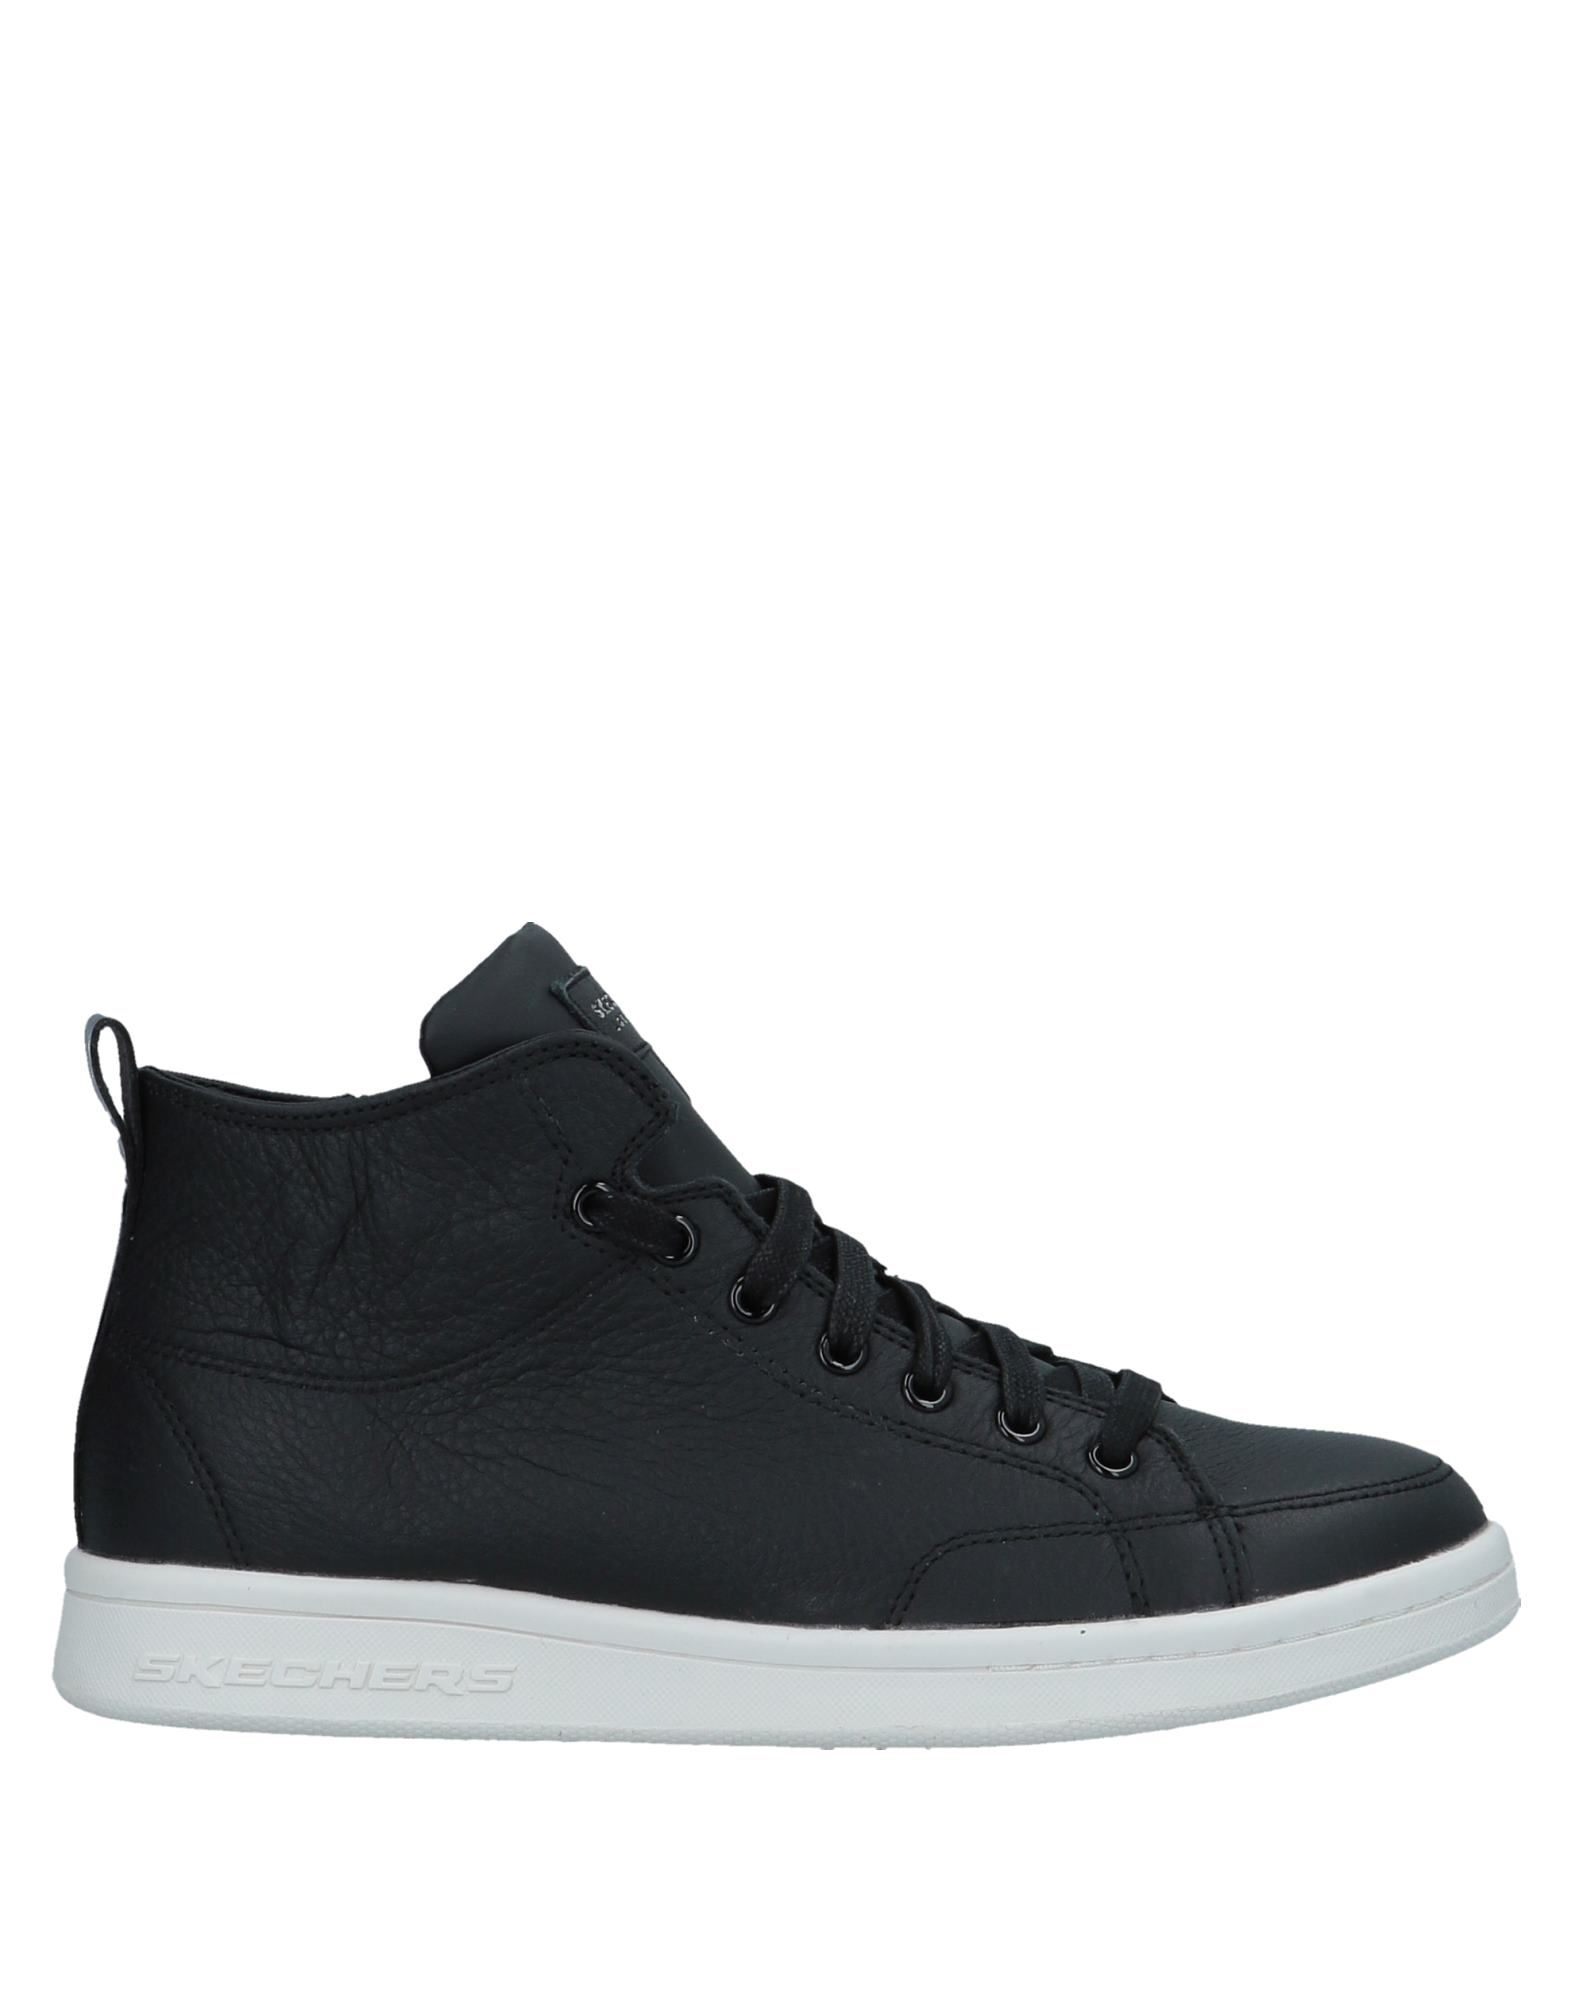 Haltbare Mode billige Schuhe Skechers Sneakers Damen  11529194KK Heiße Schuhe